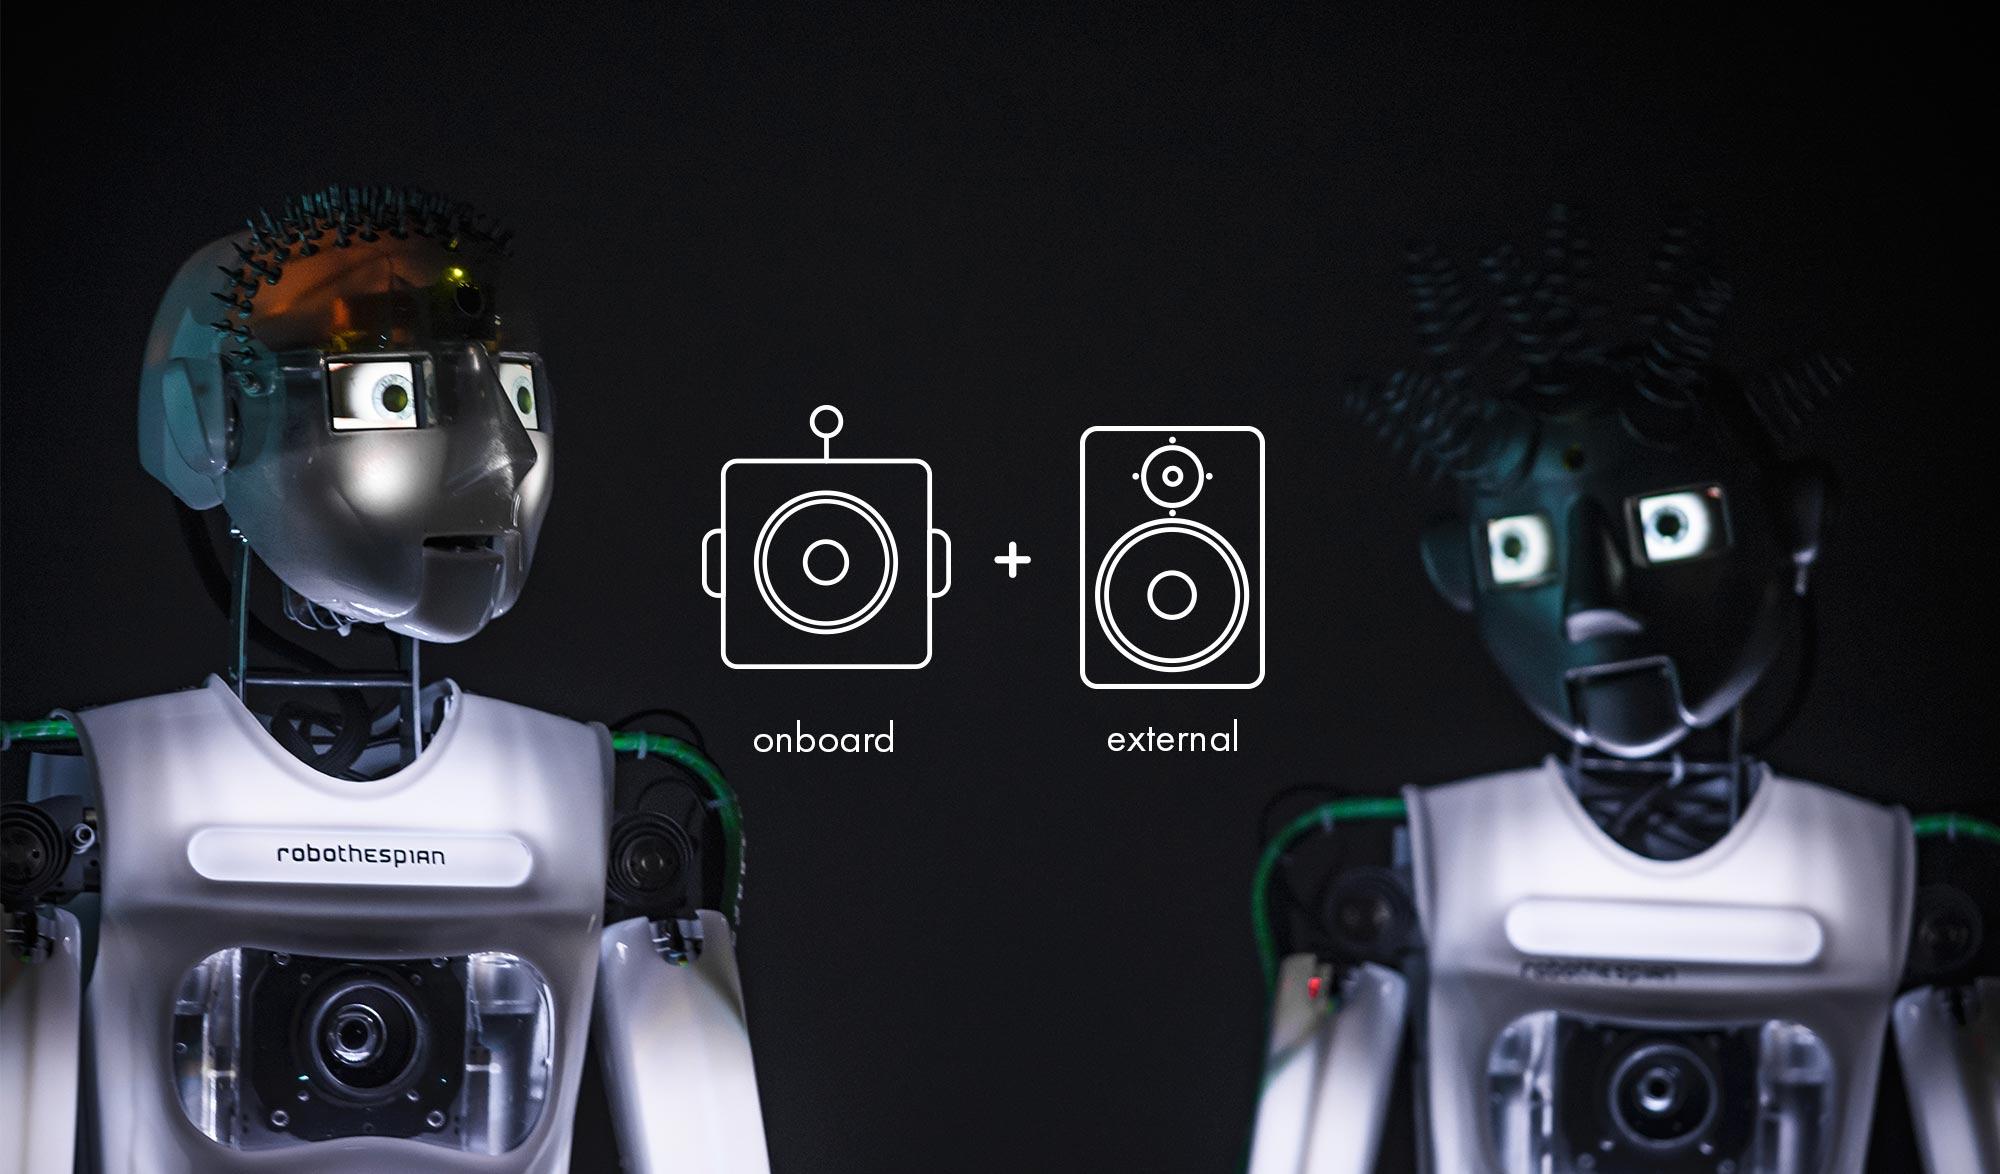 Robotic Theatre, RoboThespian Audio Options